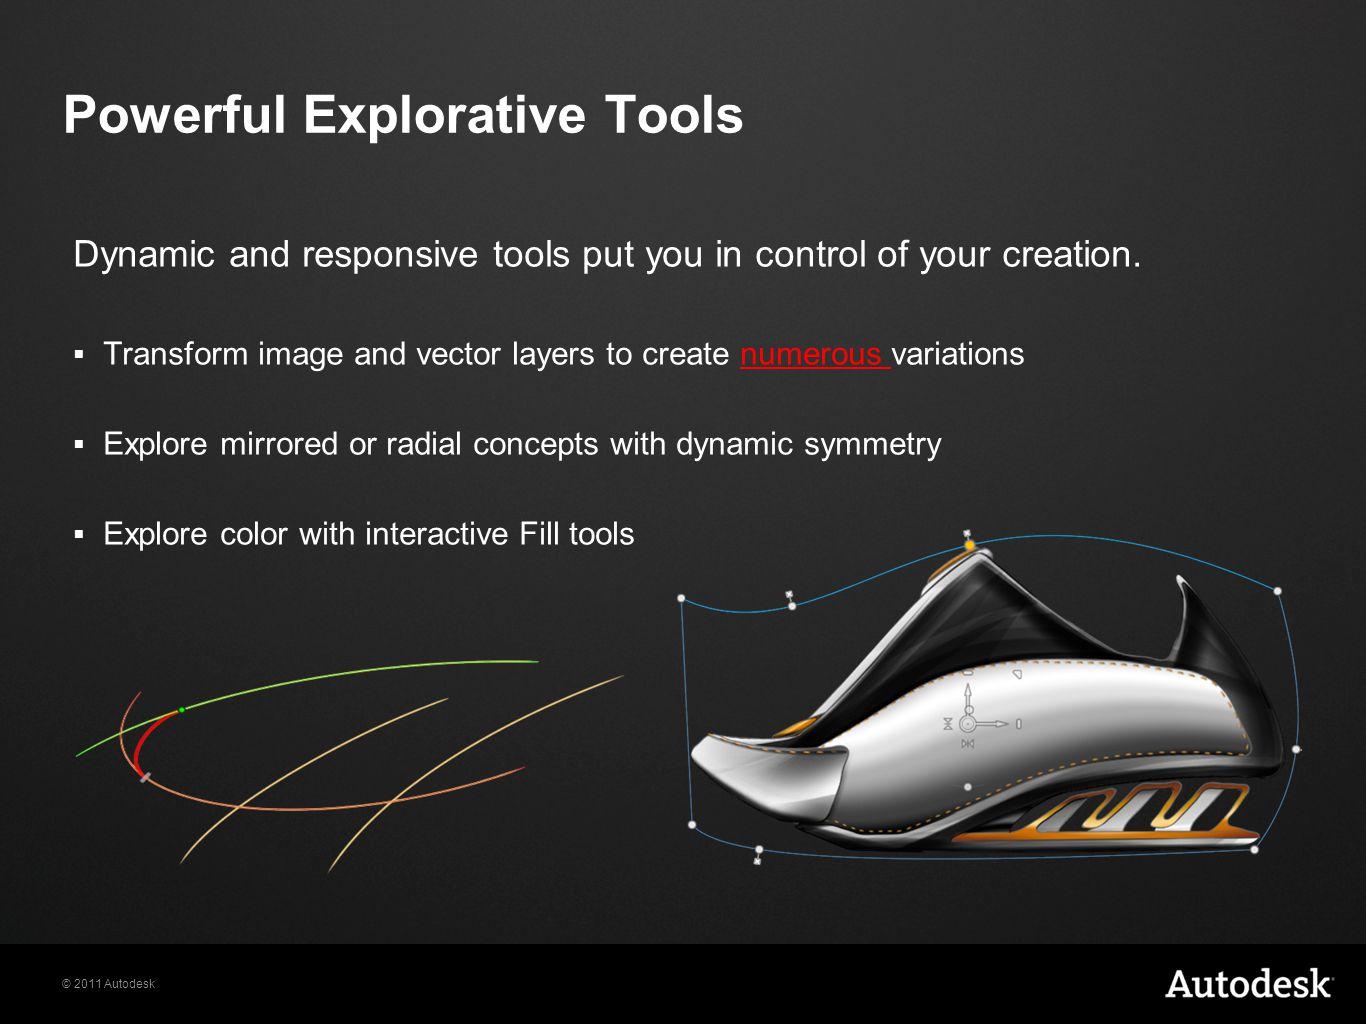 Powerful Explorative Tools